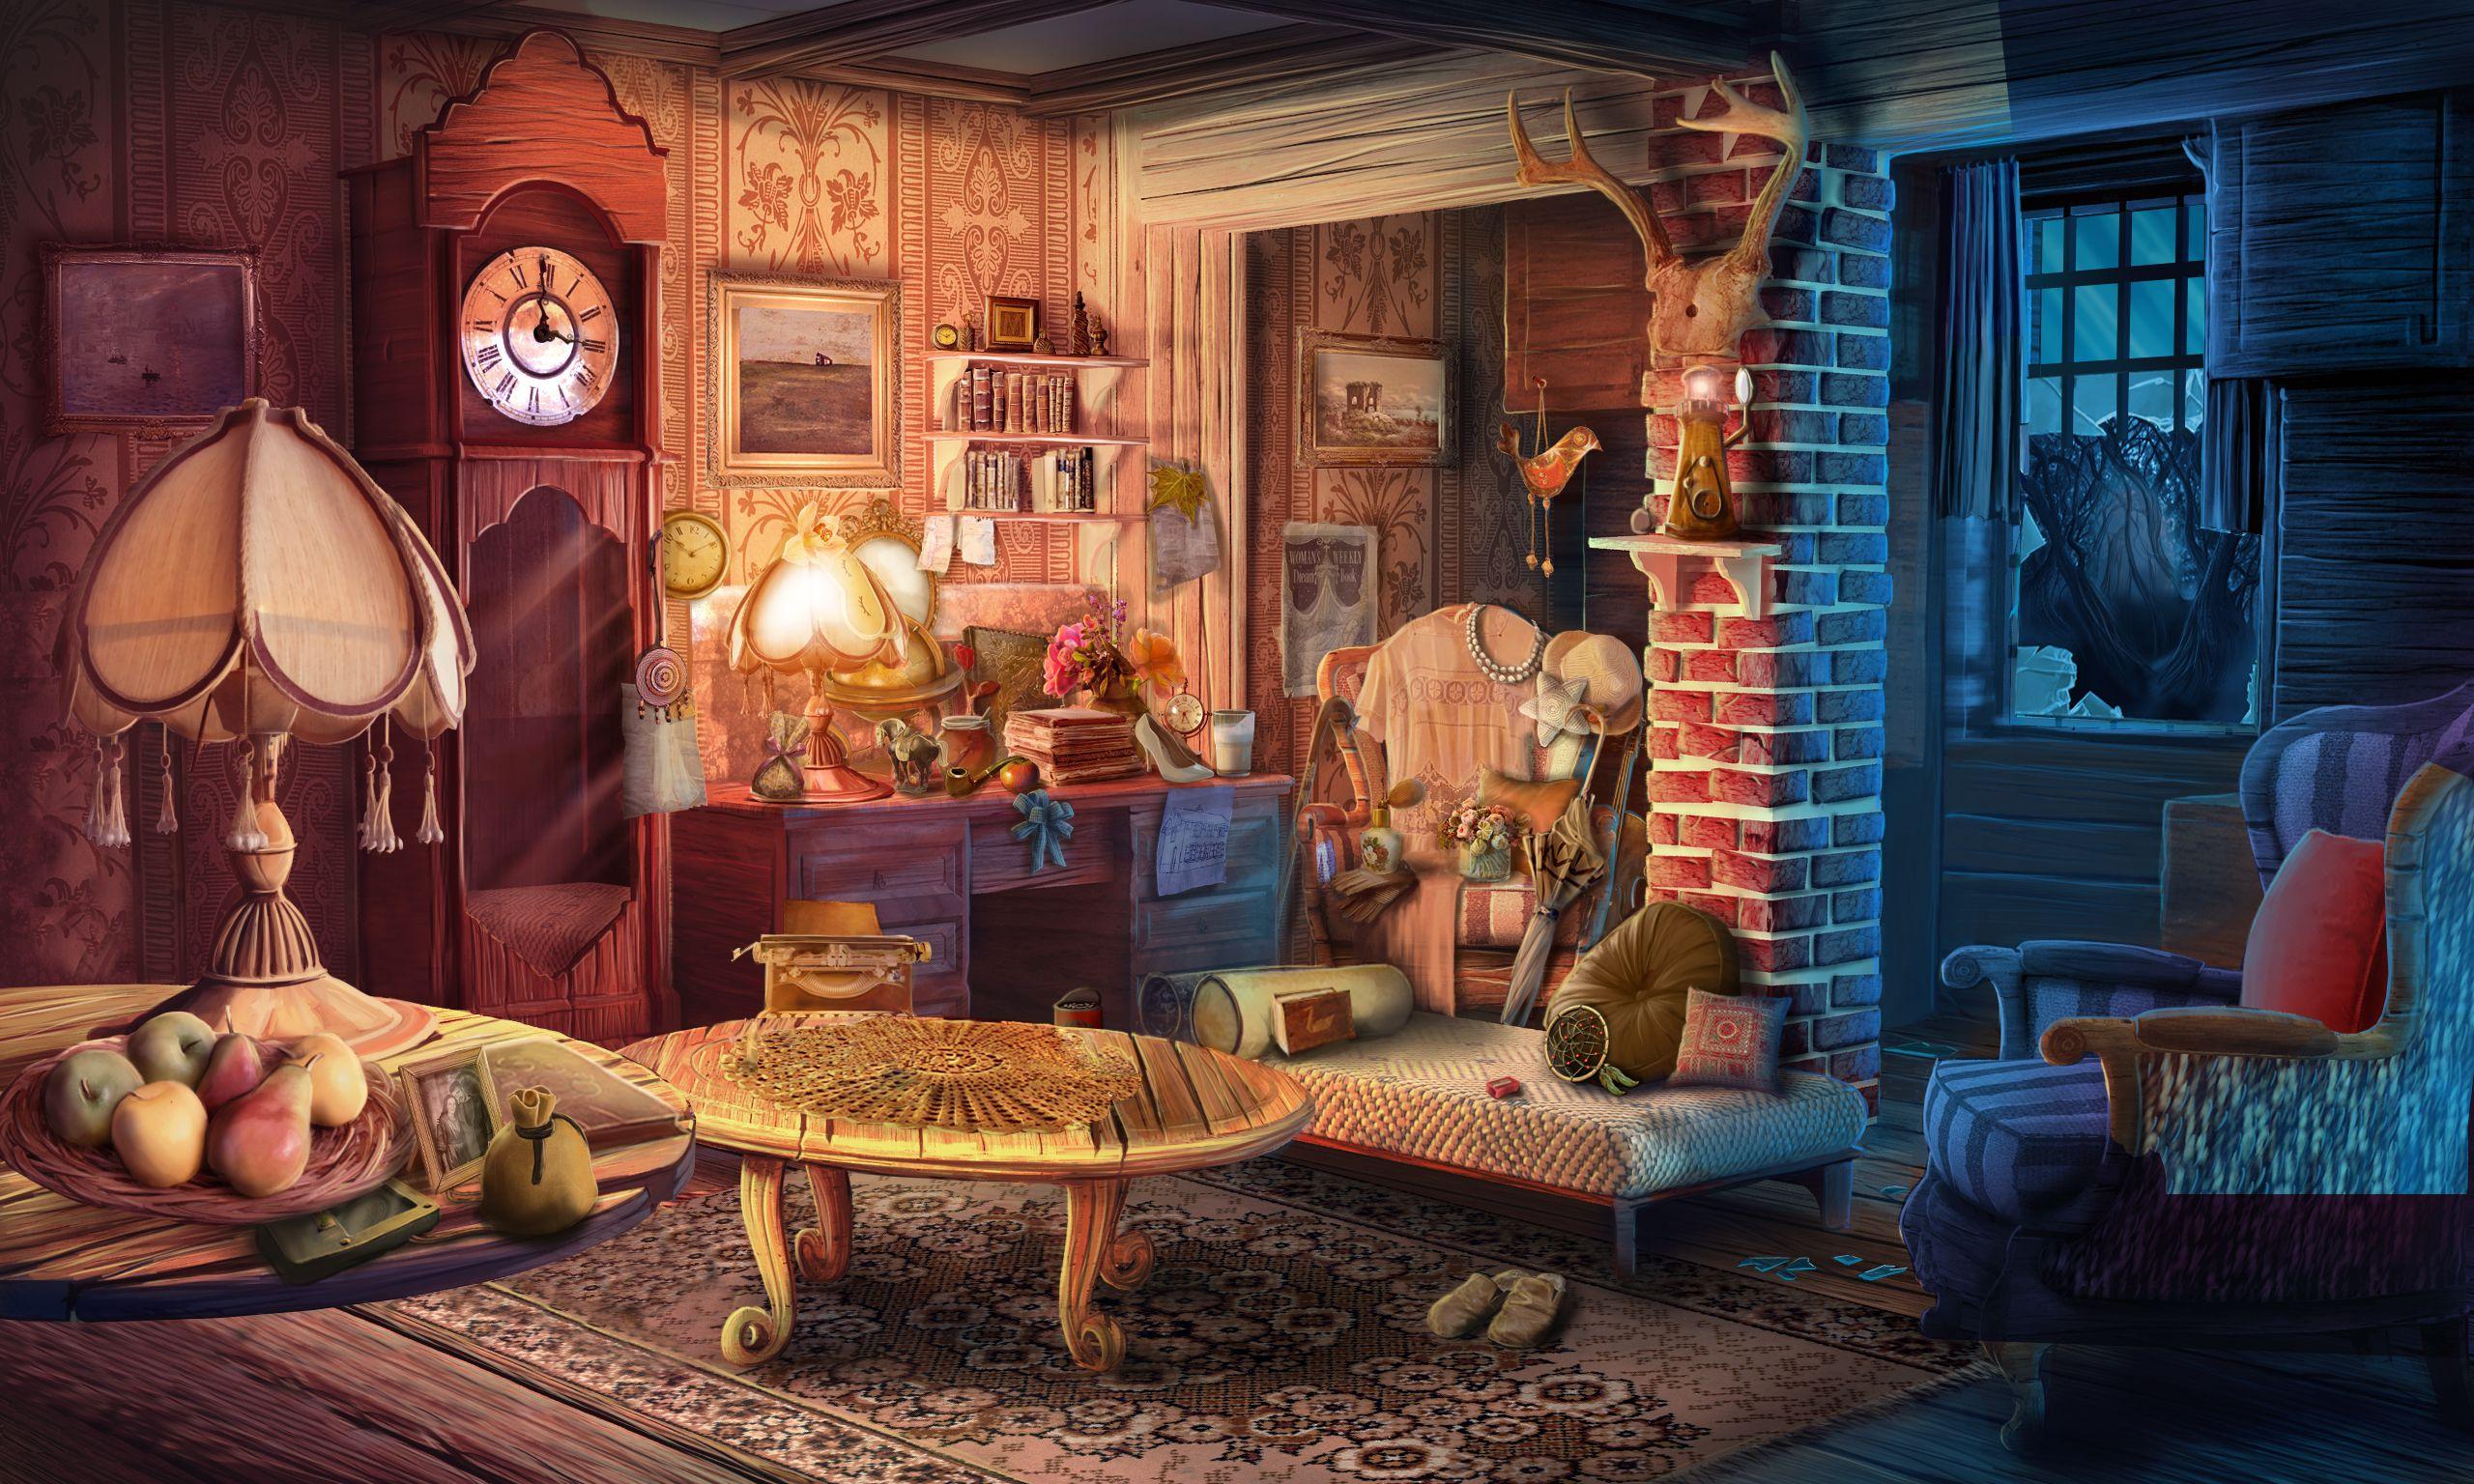 #art #gameart #gaming #gamedev #gamedevelopmentart #game #livingroom #room #furniture #vintage